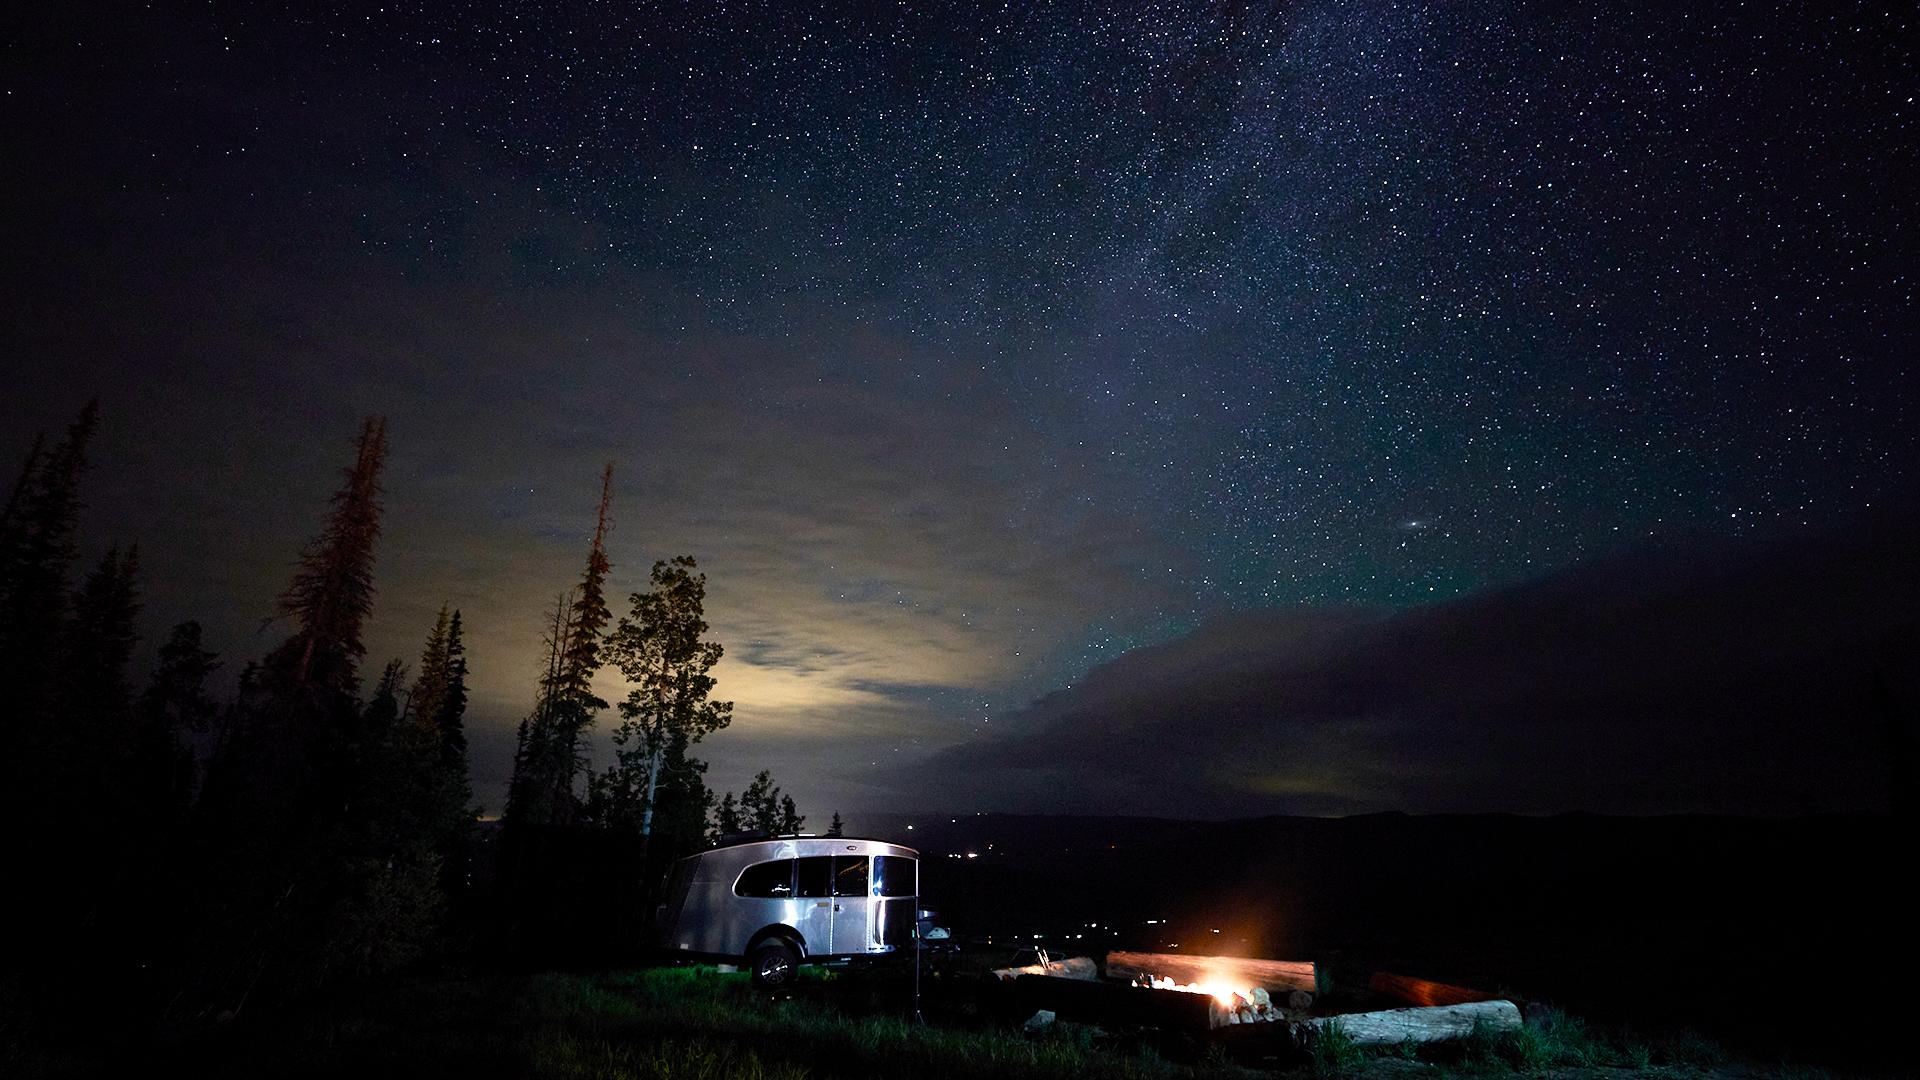 Airstream-Basecamp-20-Milky-Way-Adventures